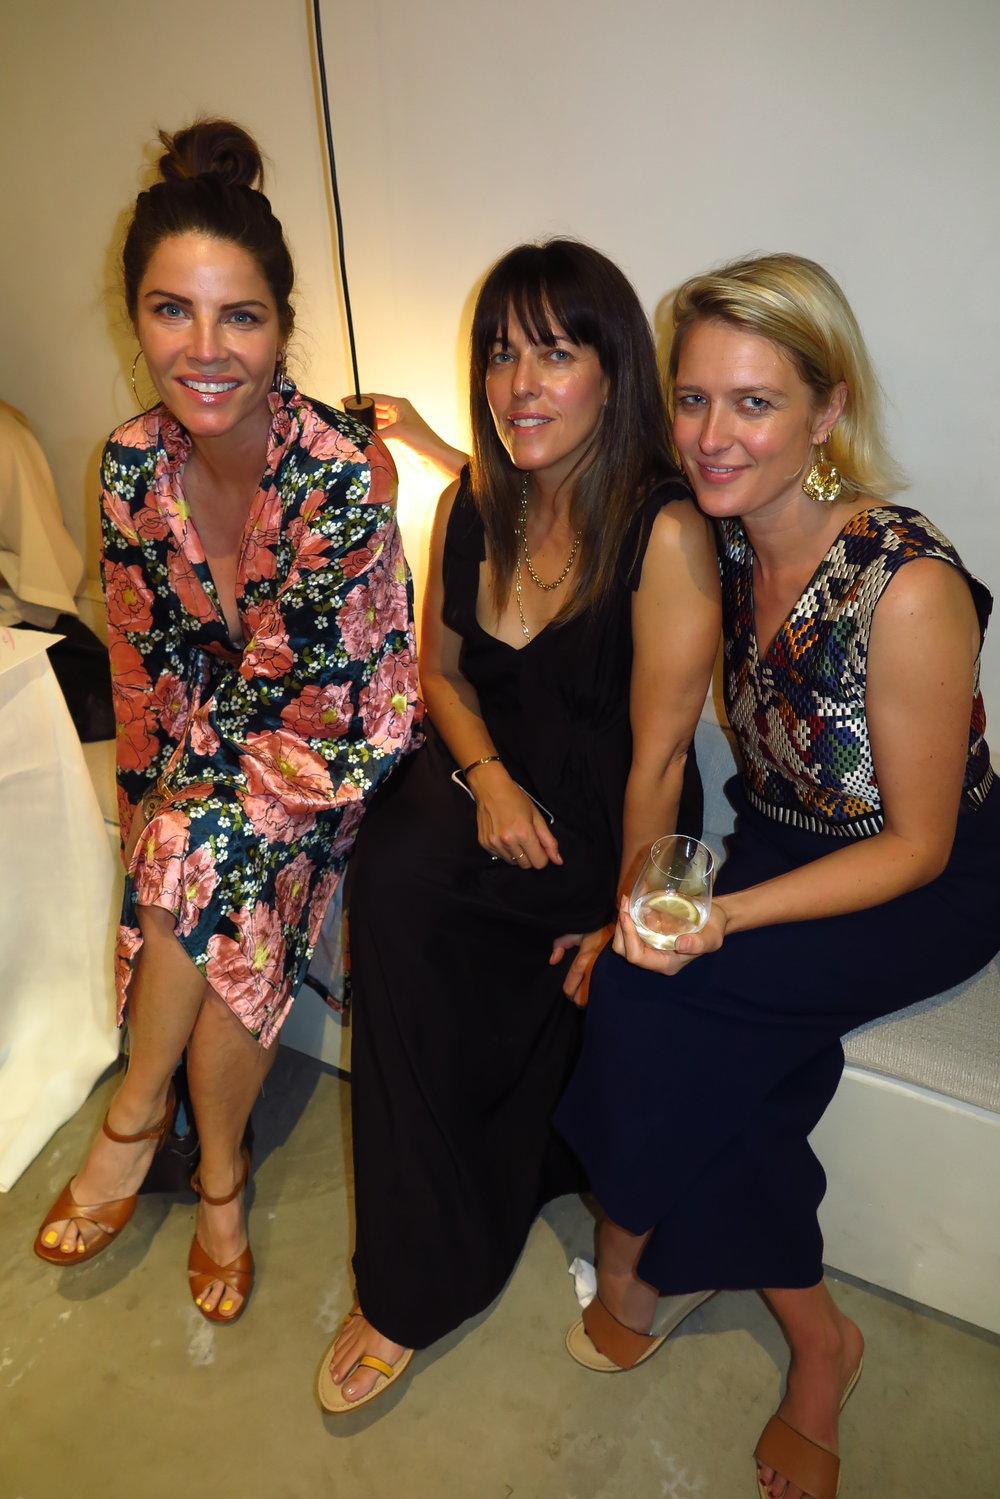 Mychelle Charters, Kelly Atterton, Anita Patrickson